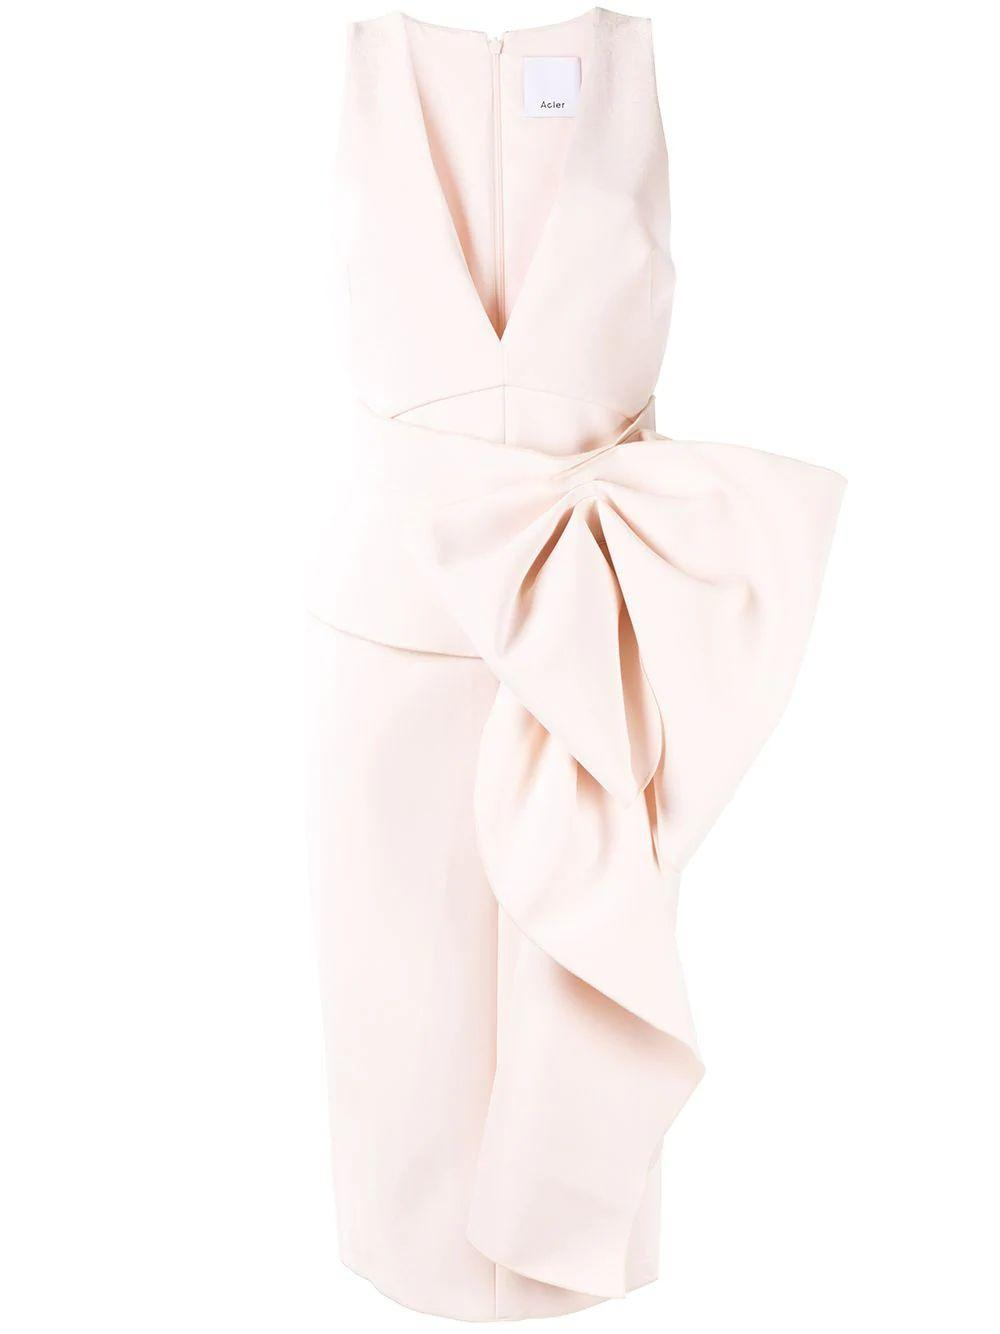 Mancroft Sleeve Less V-Neck Midi Dress